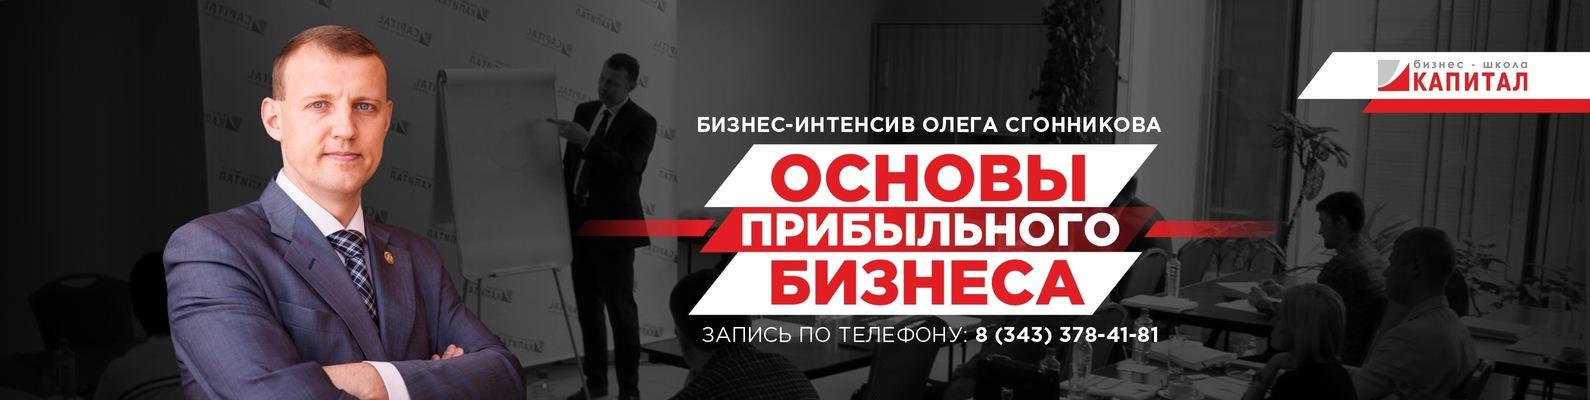 Консалтинговая группа Бизнес-школа Капитал   ВКонтакте